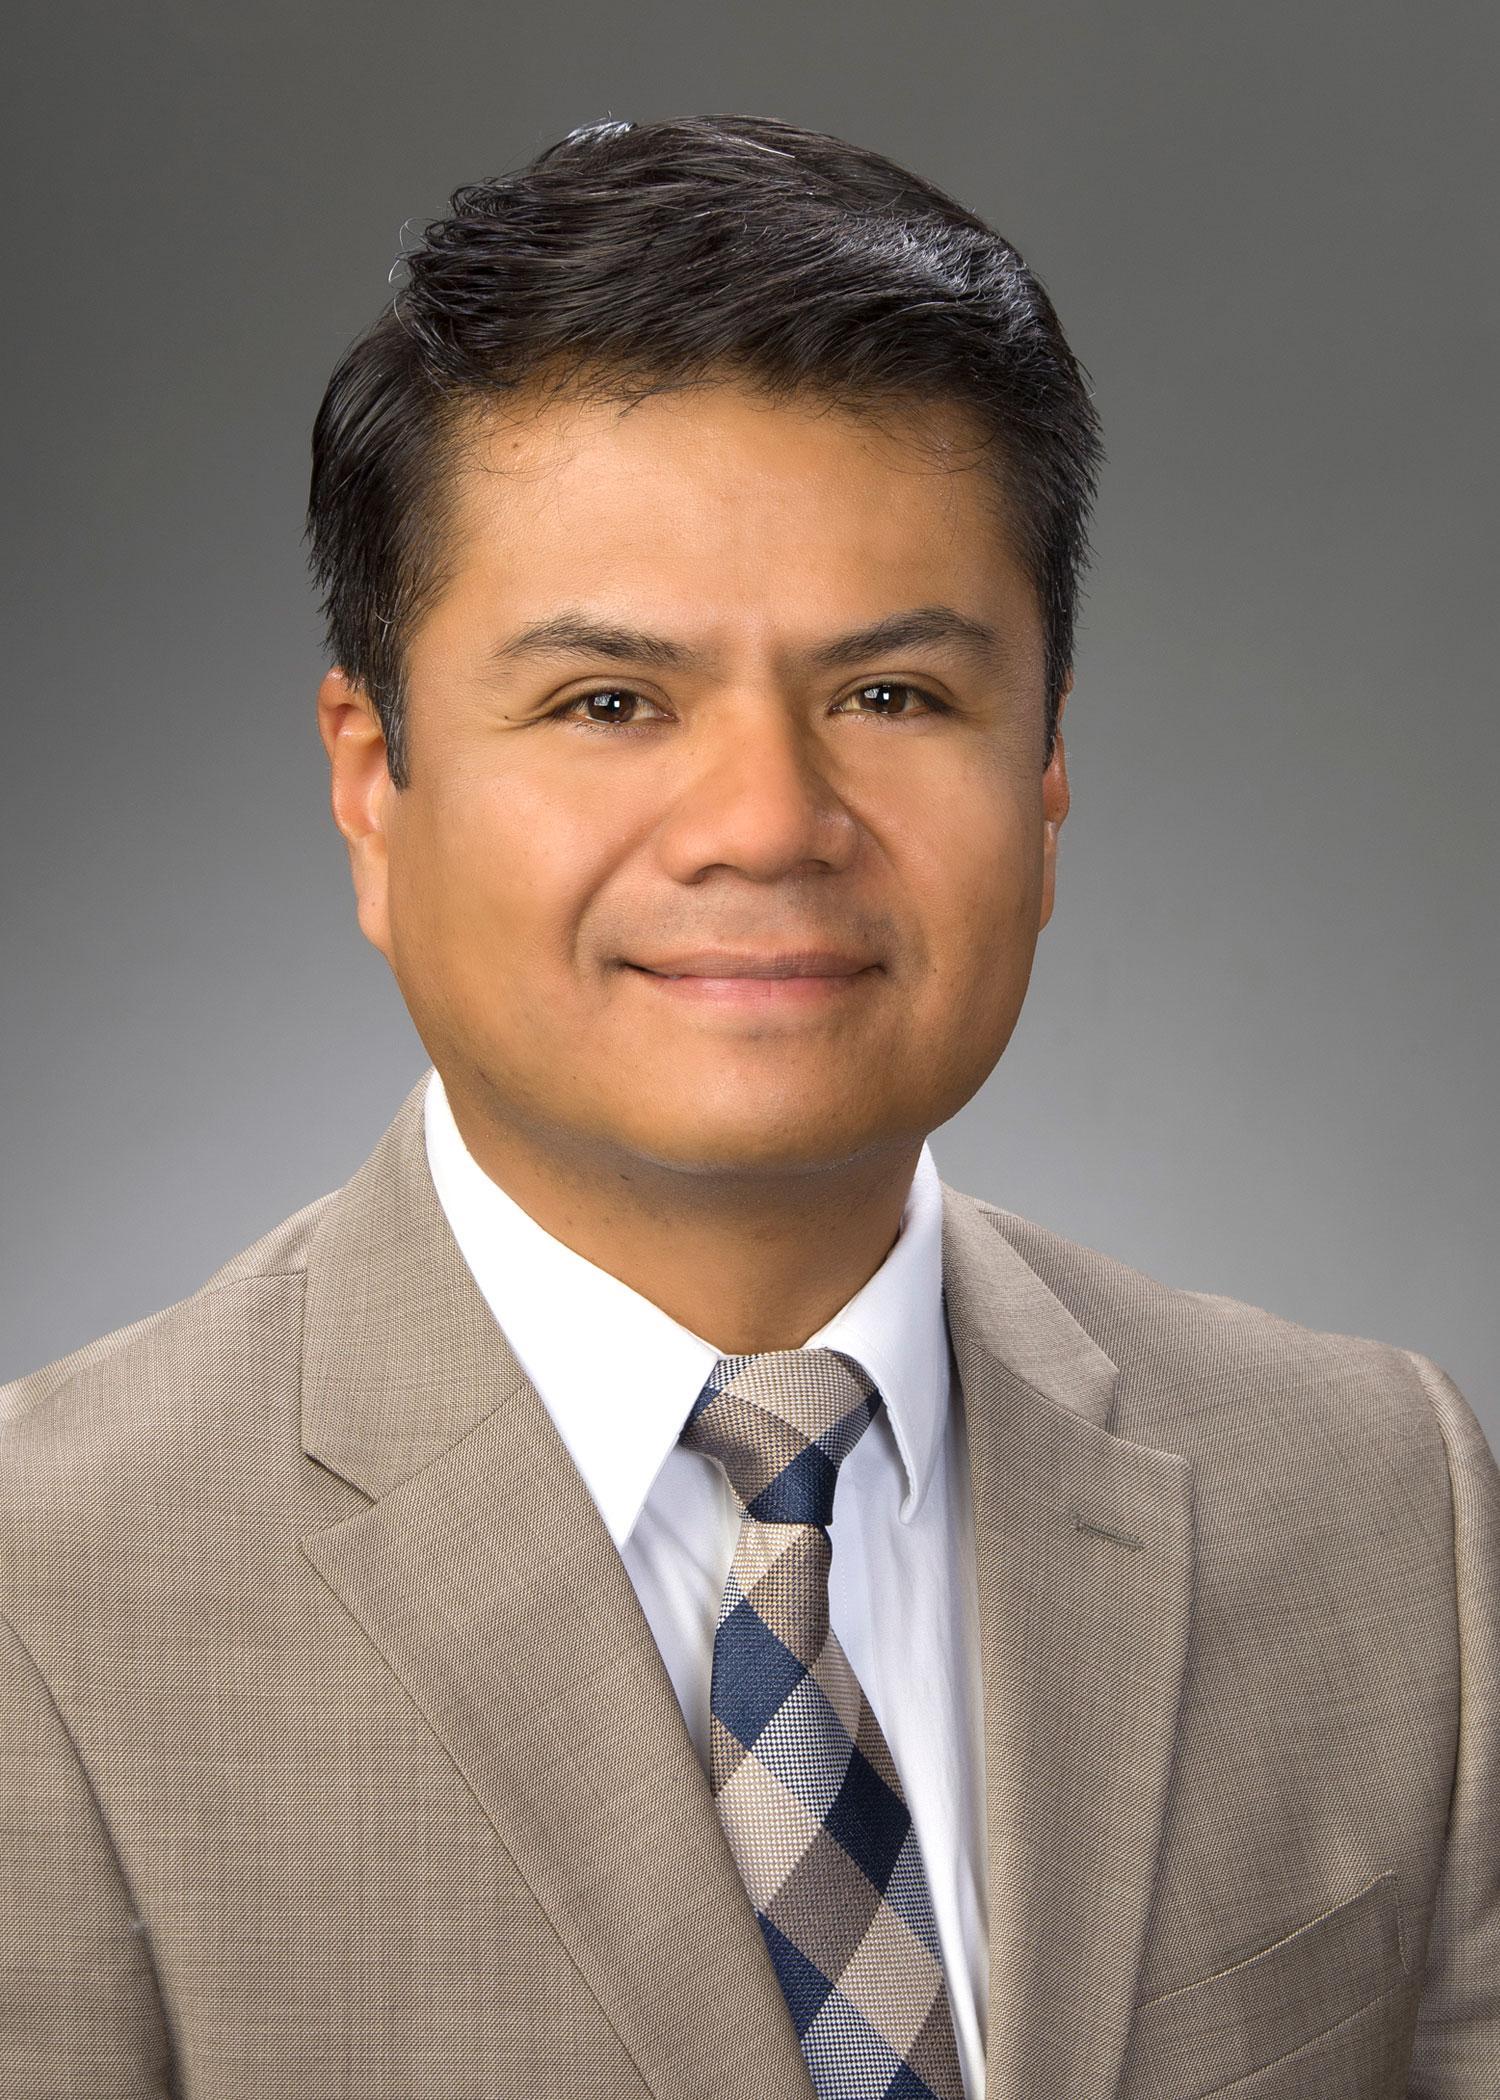 Jorge A  Rios M D  | Ohio Cancer Doctors | Zangmeister